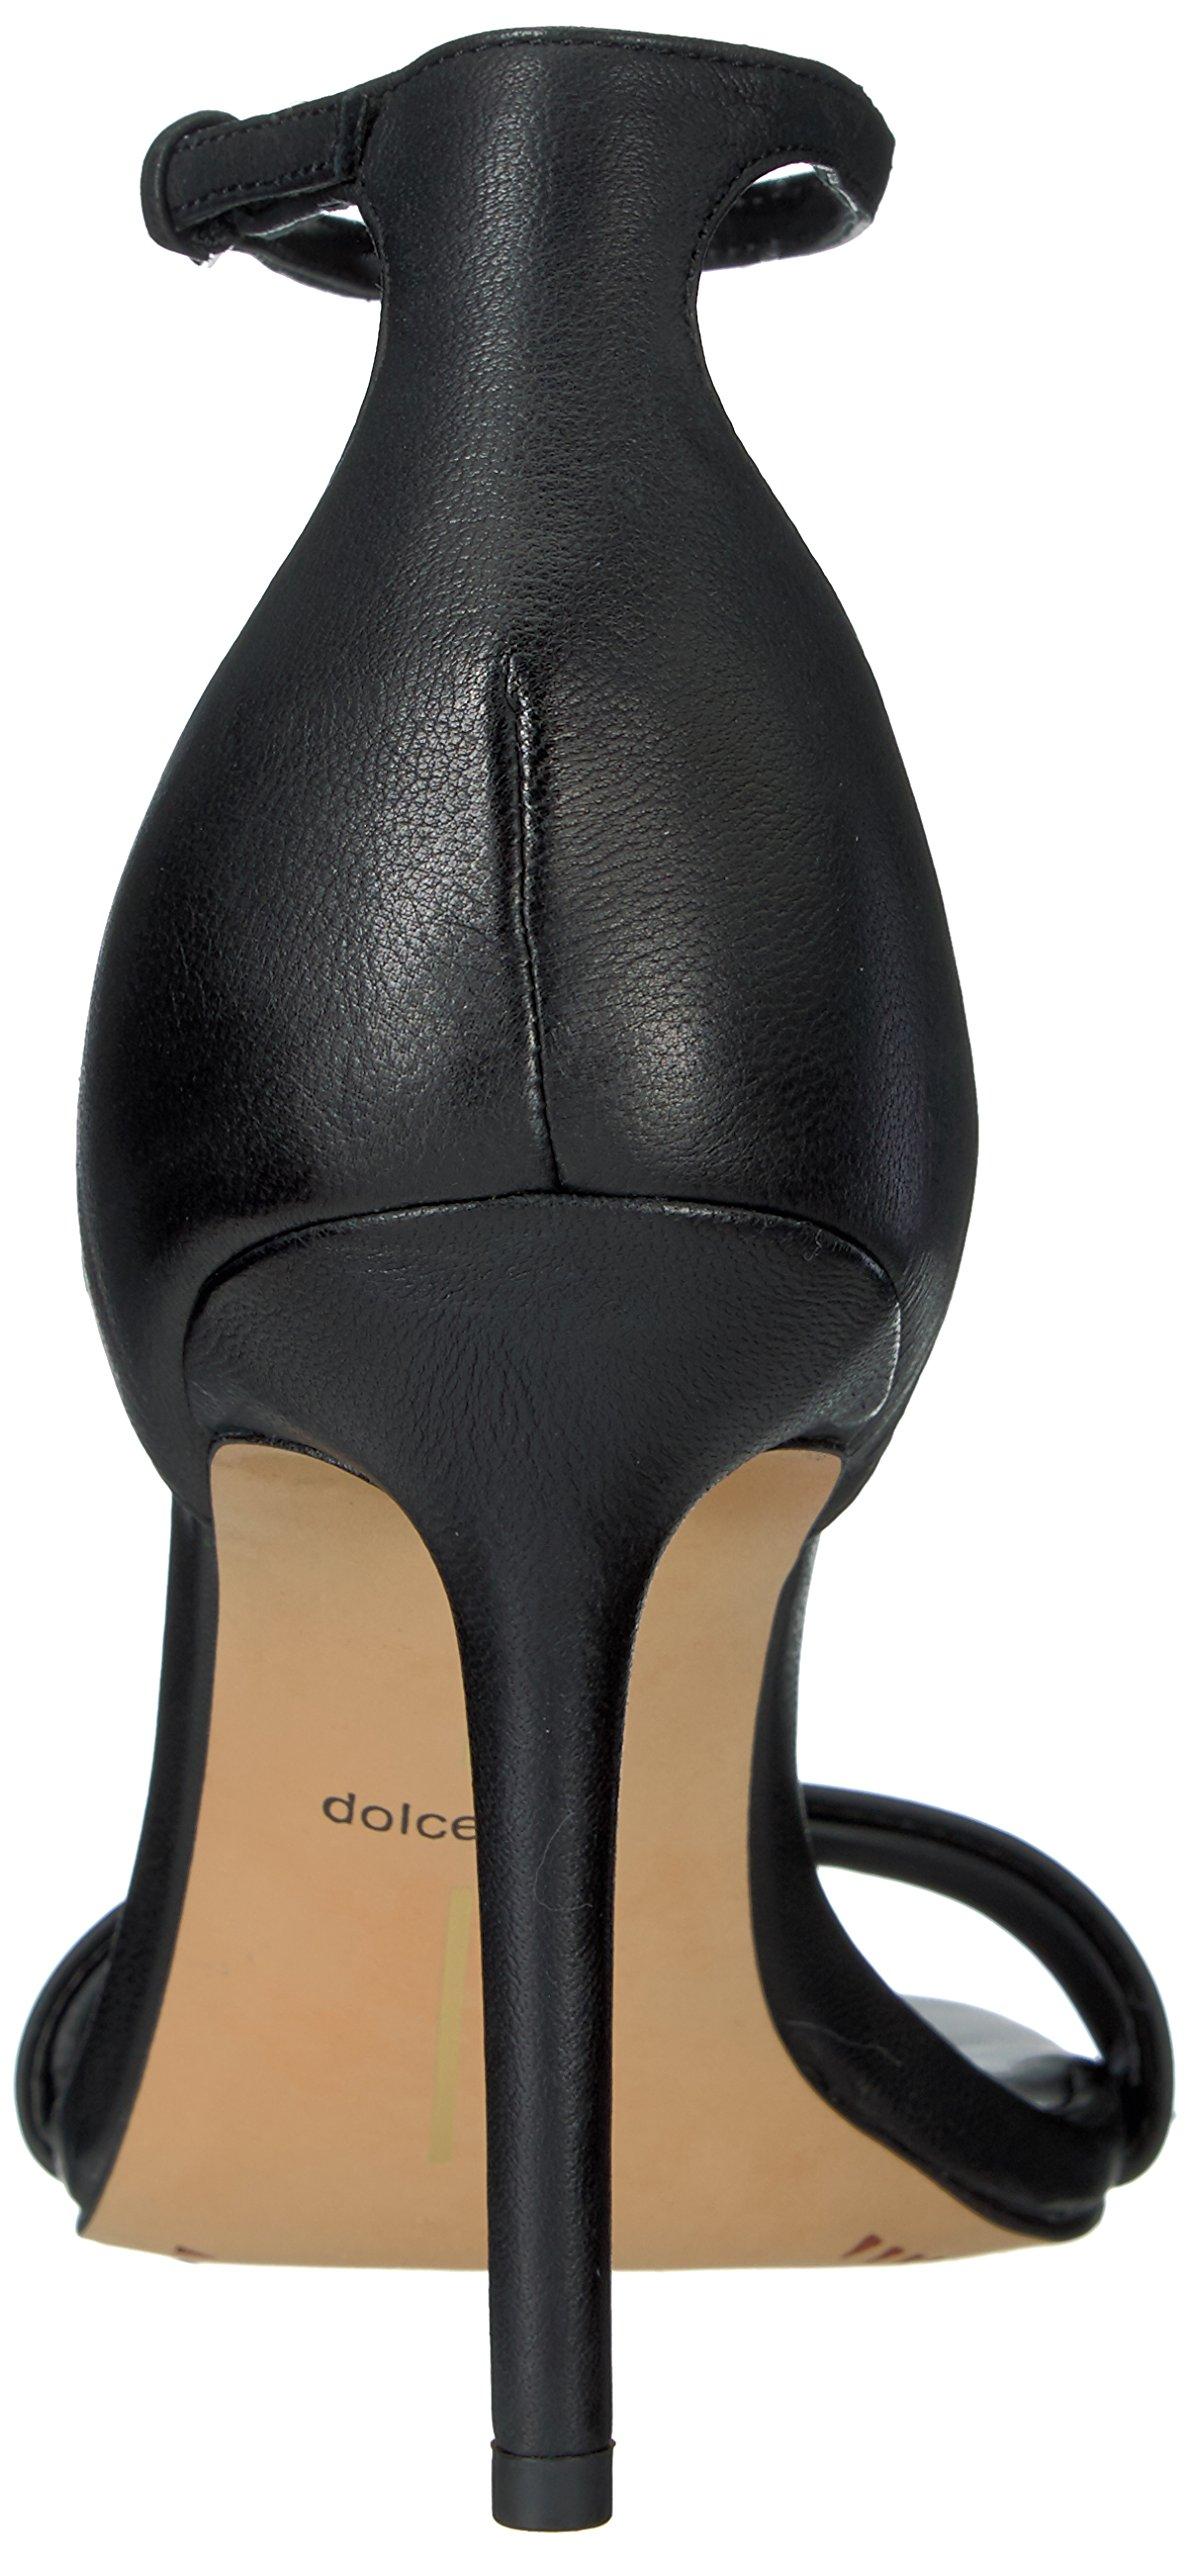 Dolce Vita Women's Halo Heeled Sandal, Black Leather, 8.5 Medium US by Dolce Vita (Image #2)